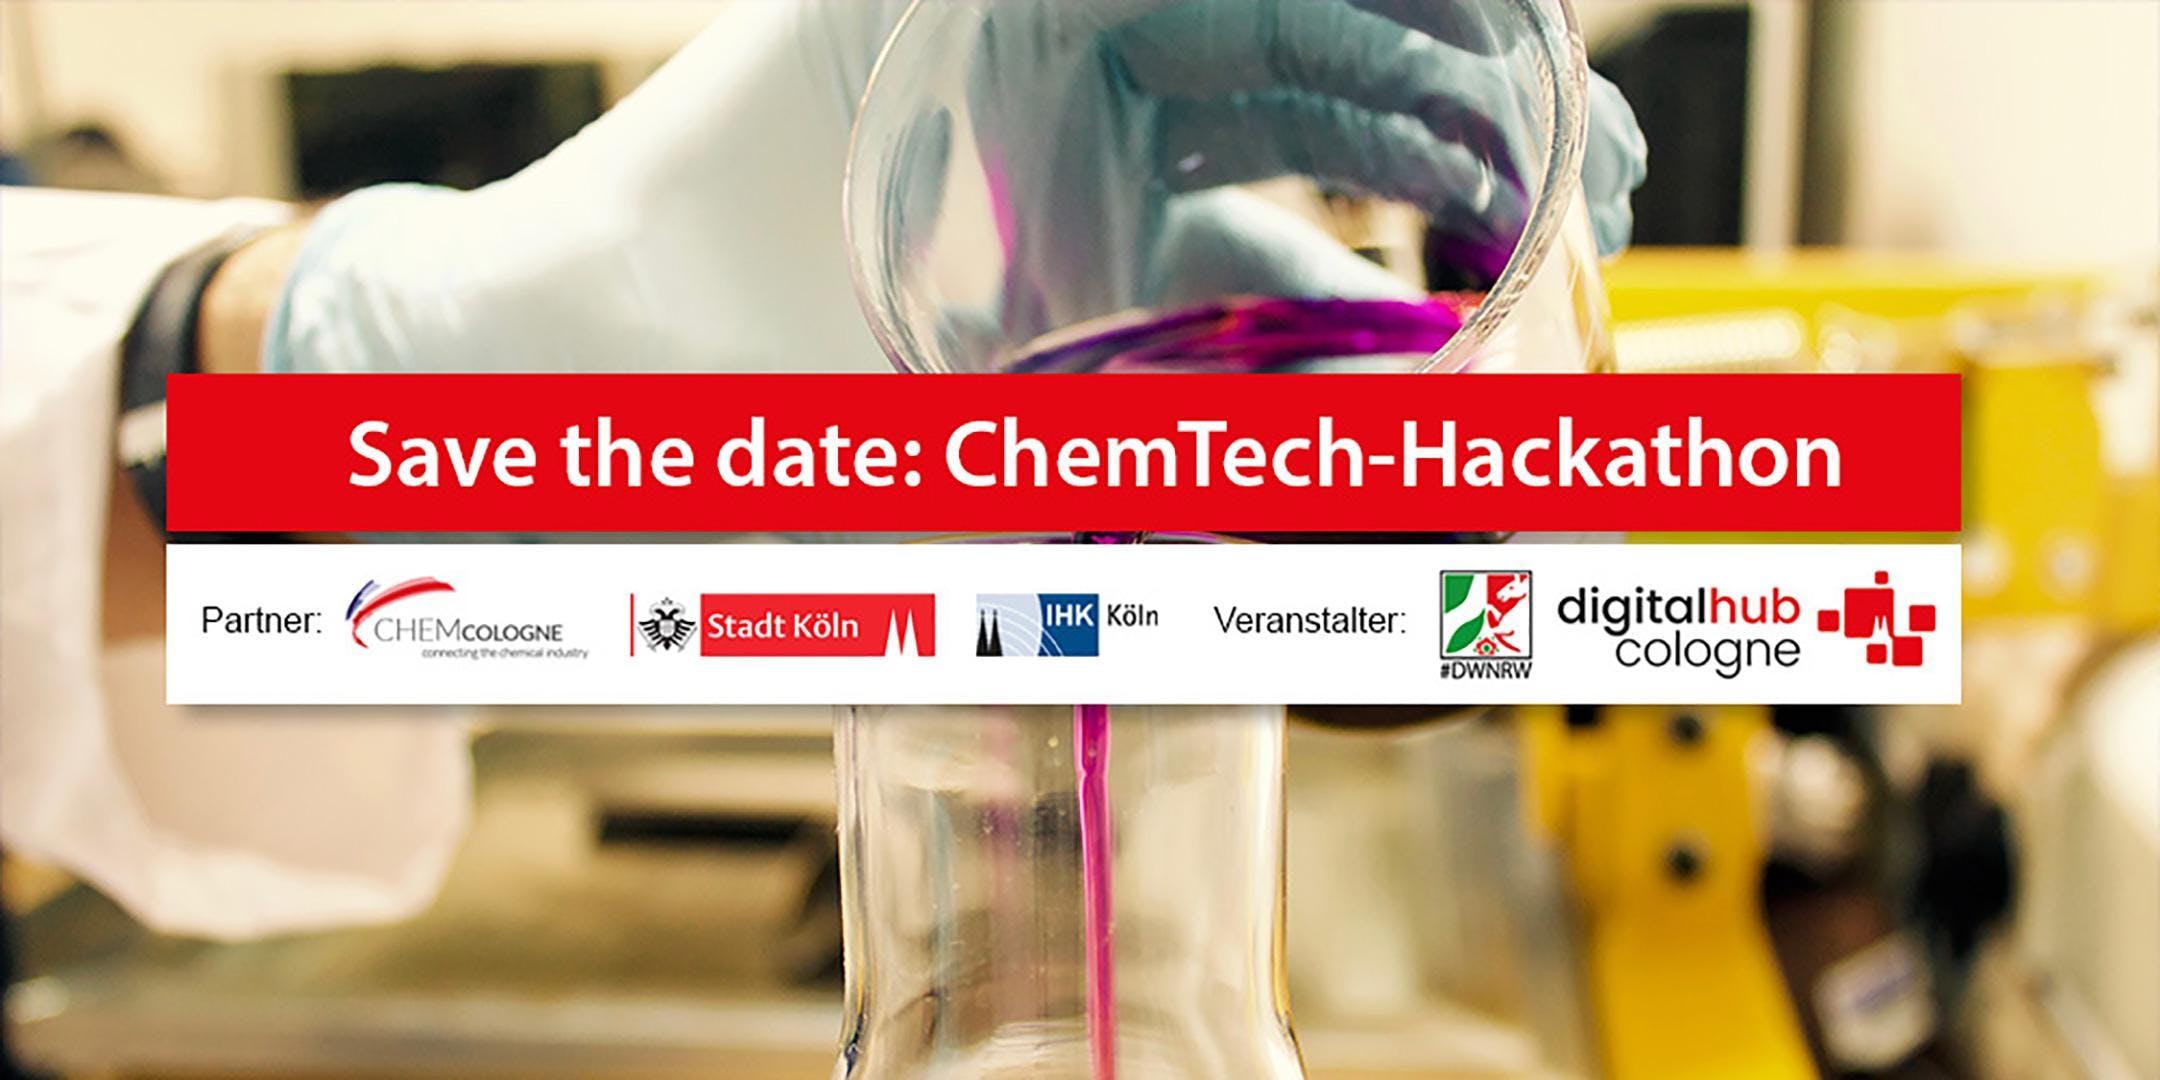 ChemTech Hackathon